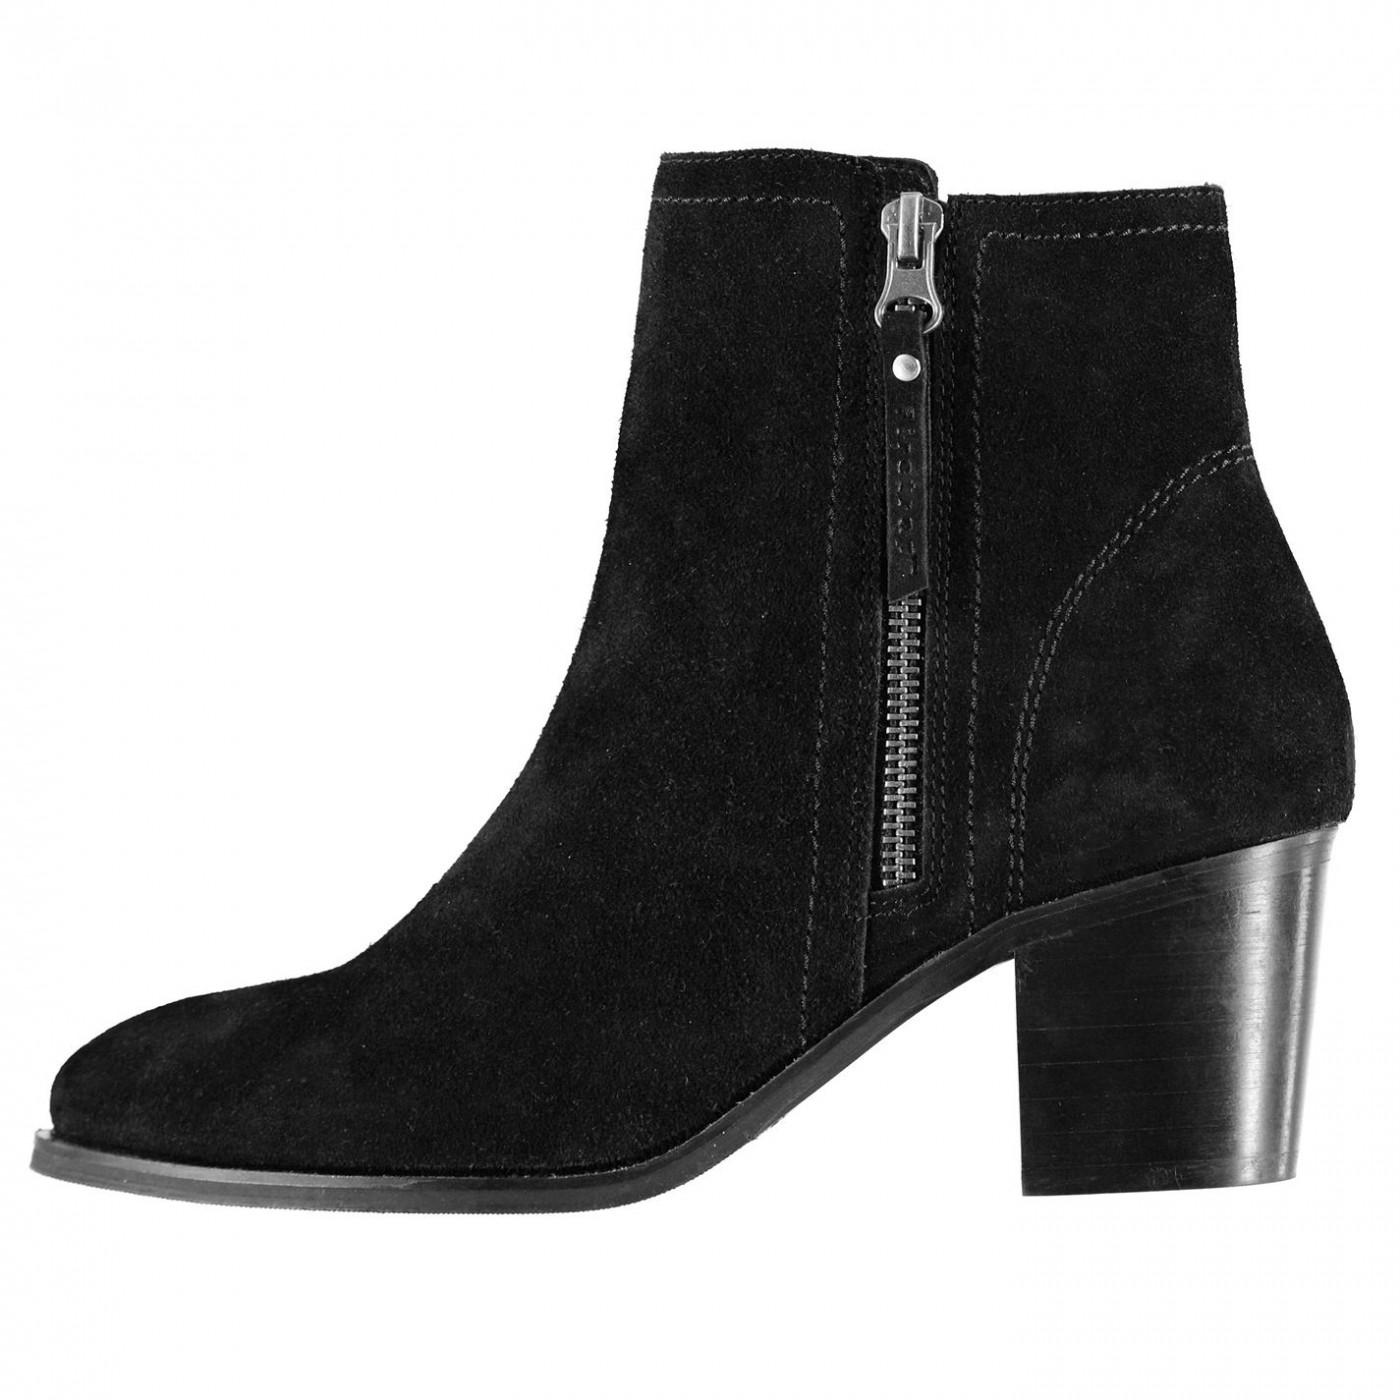 Firetrap Queenie Ladies Ankle Boots